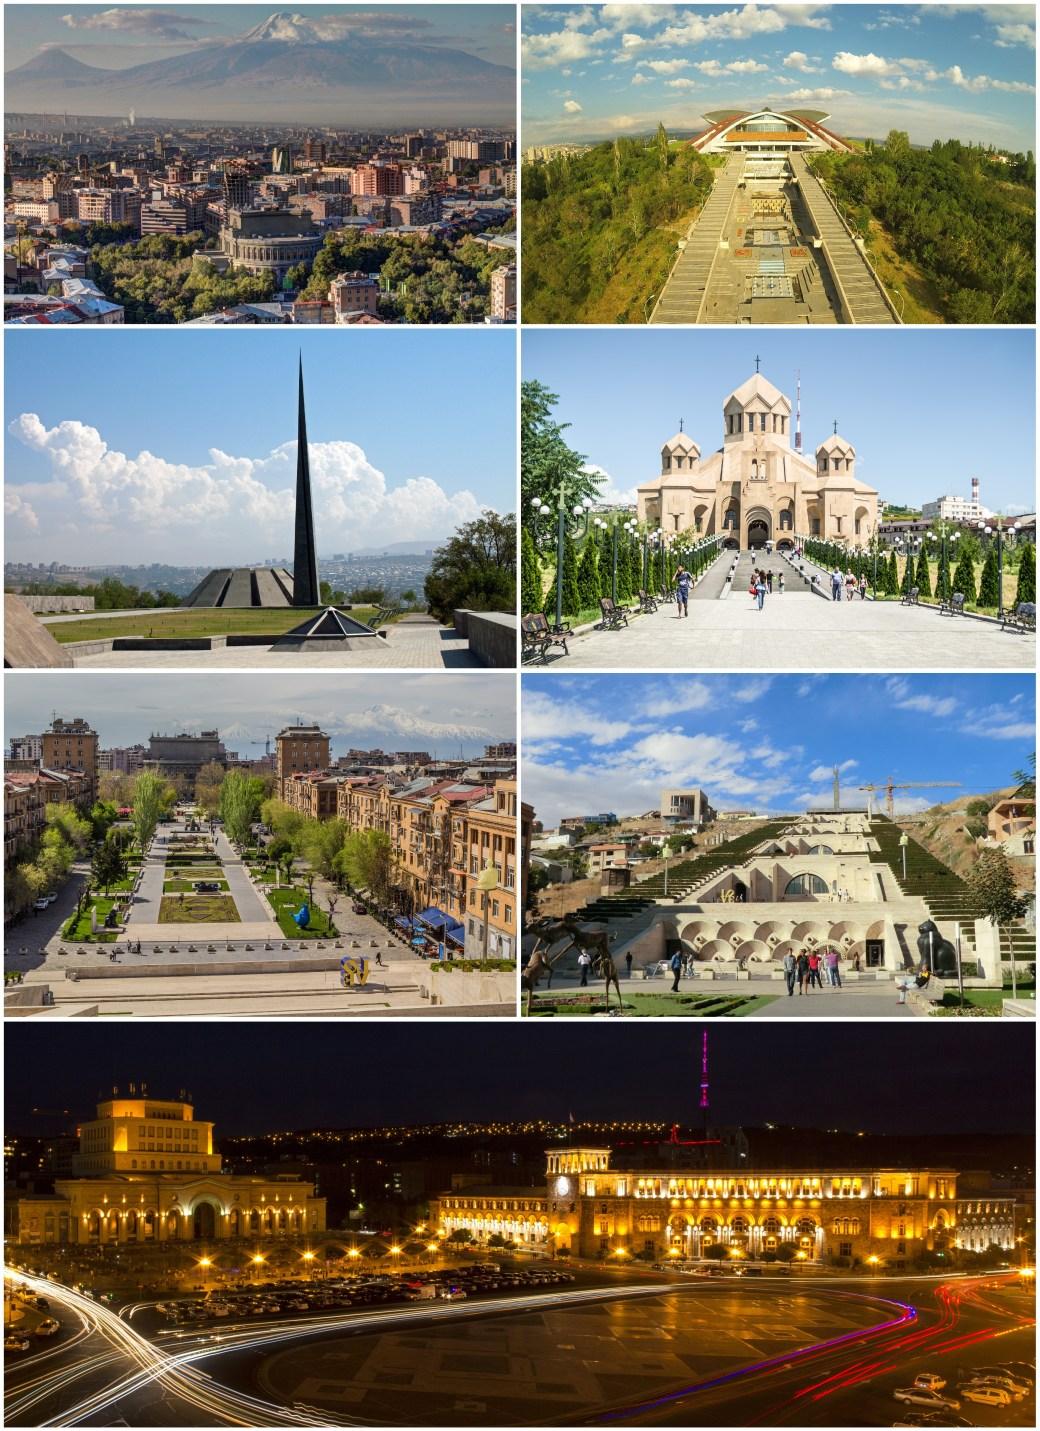 By SEE ABOVE. - File:Երեւան.JPG by Սէրուժ Ուրիշեան © {{cc-by-sa-3.0}}File:Մարզահամերգային Համալիր.jpg by Mosinyan © {{cc-by-sa-3.0}}File:Armenia - Genocide Monument (5034649480).jpg by Shaun Dunphy © {{cc-by-sa-2.0}}File:Cathedral Yerevan Saint Gregory.jpg by Elena Buntik © {{cc-by-sa-2.0}}File:View from the Cafesjian Center for the Arts.jpg by Սէրուժ Ուրիշեան (Serouj Ourishian) © {{cc-by-sa-3.0}}File:Cascade of Yerevan.JPG by Benoît Prieur © {{cc-by-sa-3.0}}File:Հանրապետության Հրապարակ.jpg by Sonanik © {{cc-by-sa-3.0}}, CC BY-SA 3.0, https://commons.wikimedia.org/w/index.php?curid=45315791